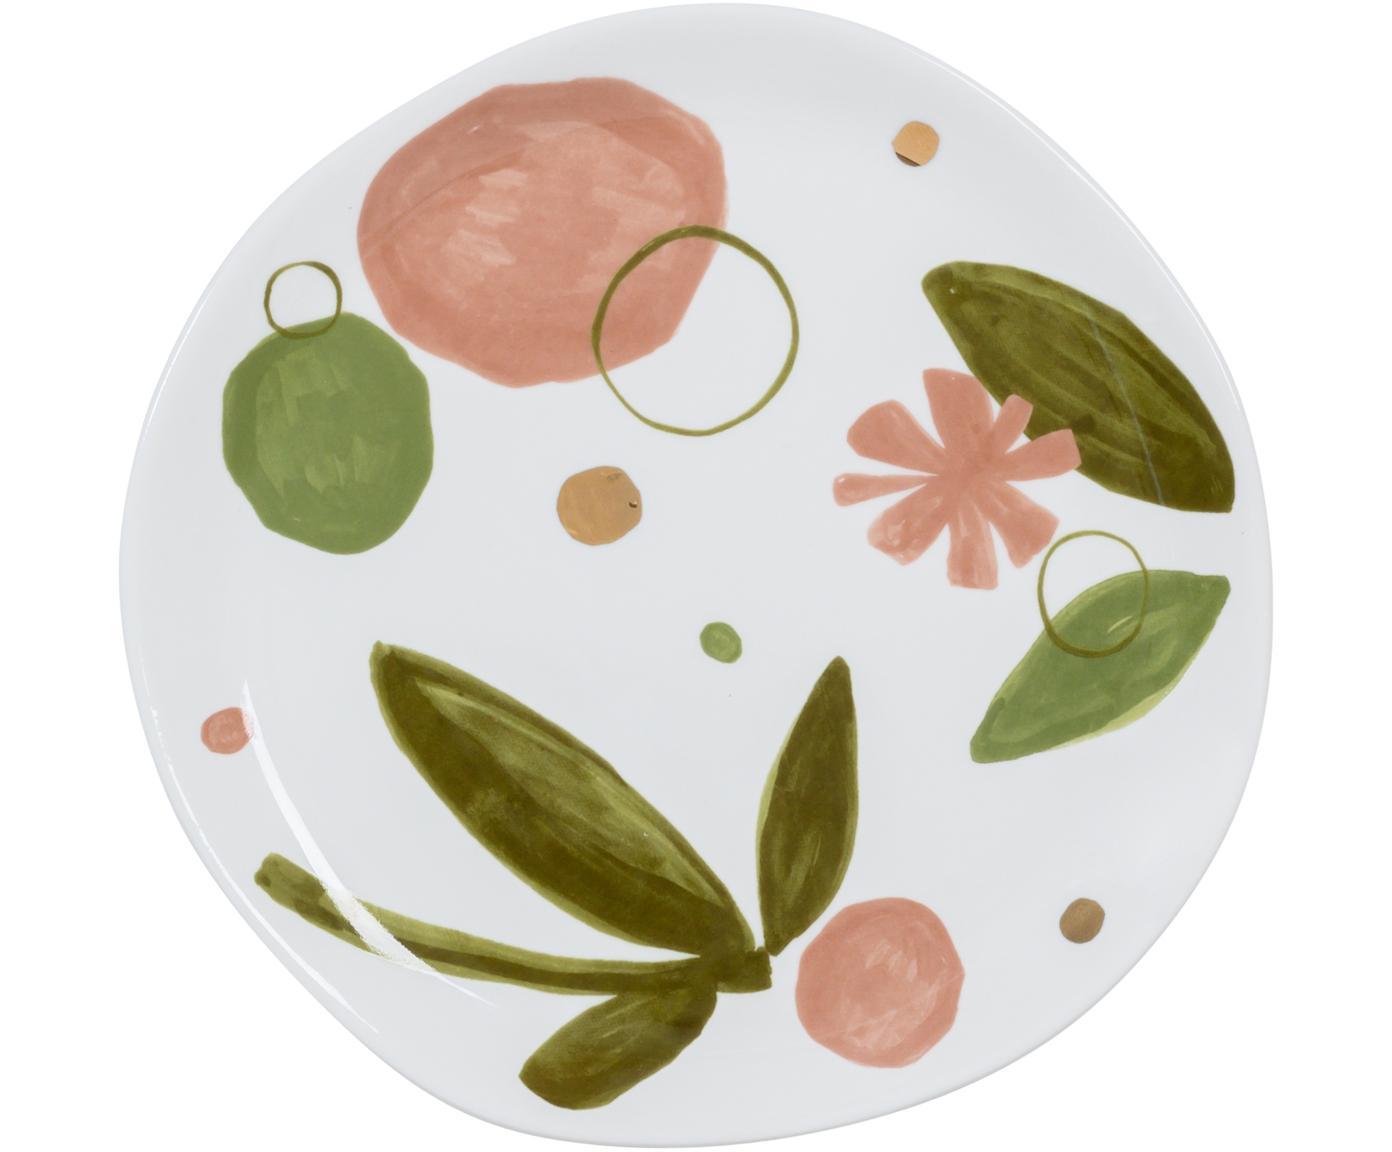 Frühstücksteller Expressive, New Bone China, Weiß, Rosa, Grün, Goldfarben, Ø 17 cm